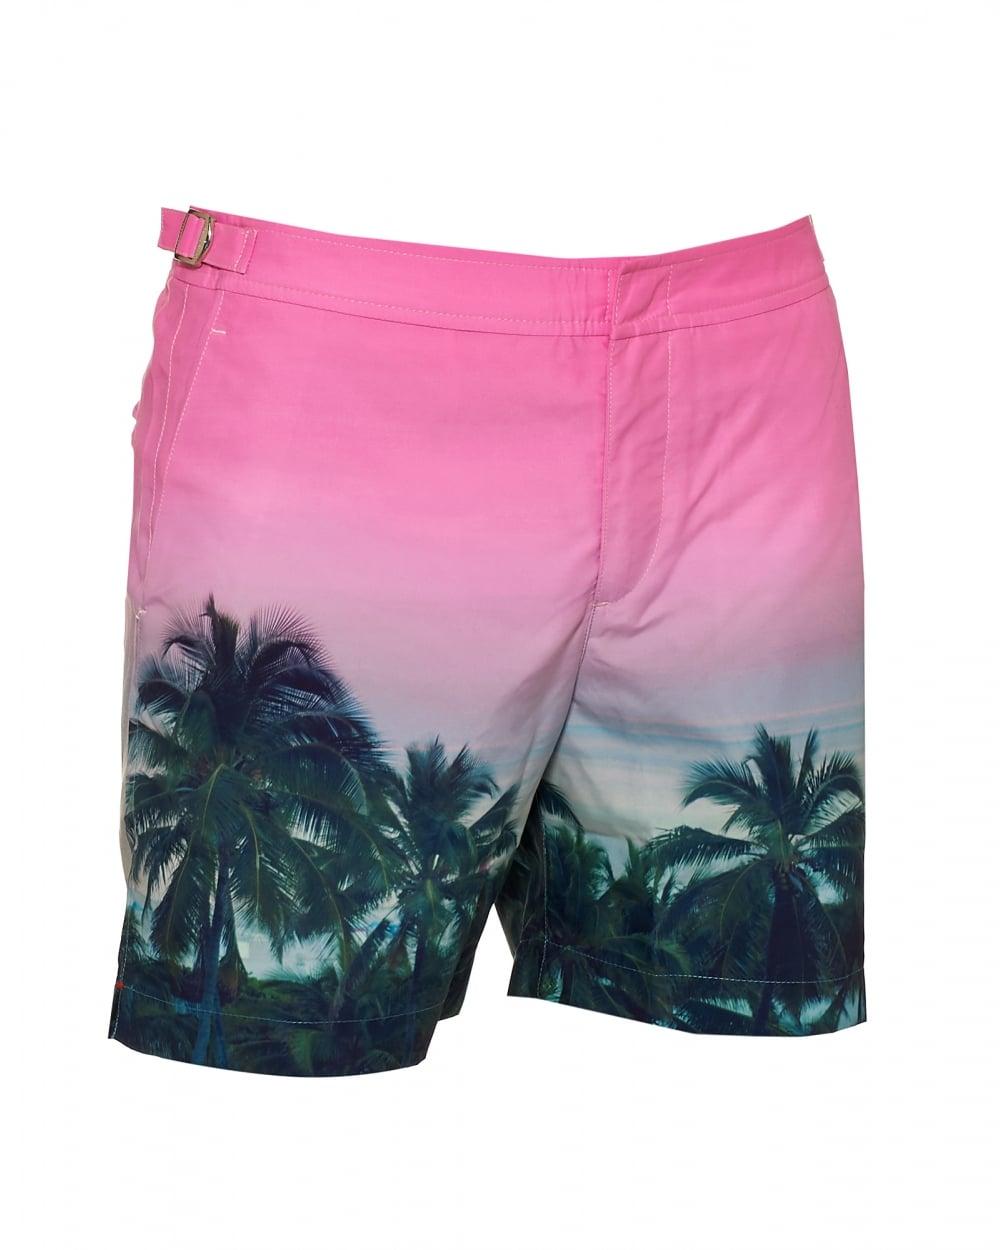 4e0265a271 Orlebar Brown Mens Bulldog Palms Aplenty Swim Shorts, Pink ...